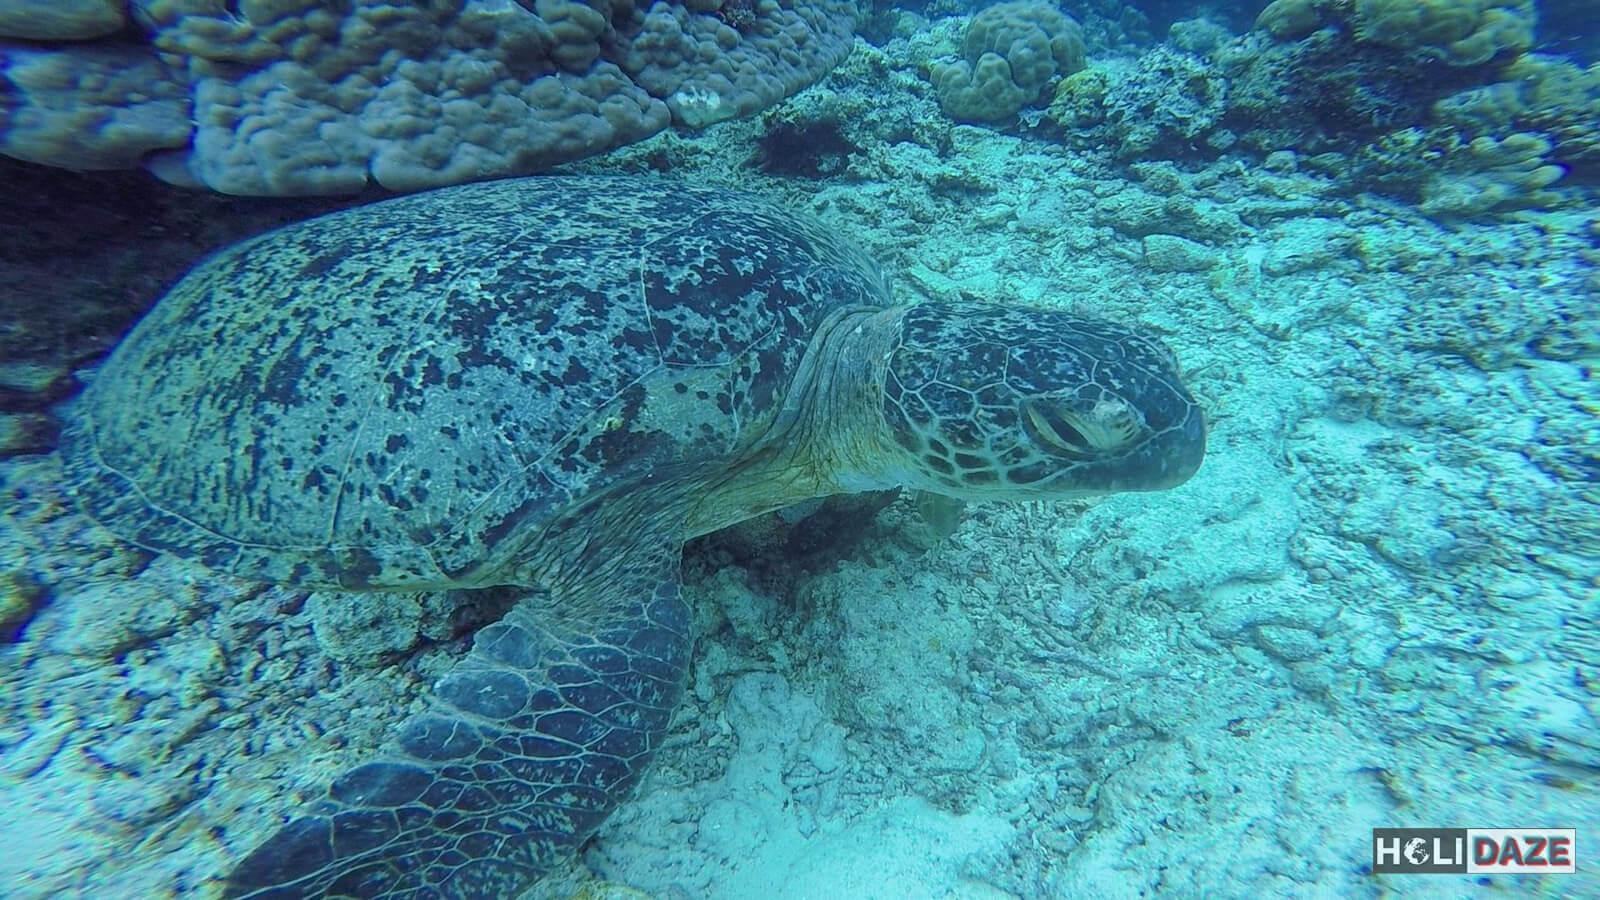 Mabul Island + Kapalai + Other Great Semporna Dive Spots (Besides Sipadan) The HoliDaze